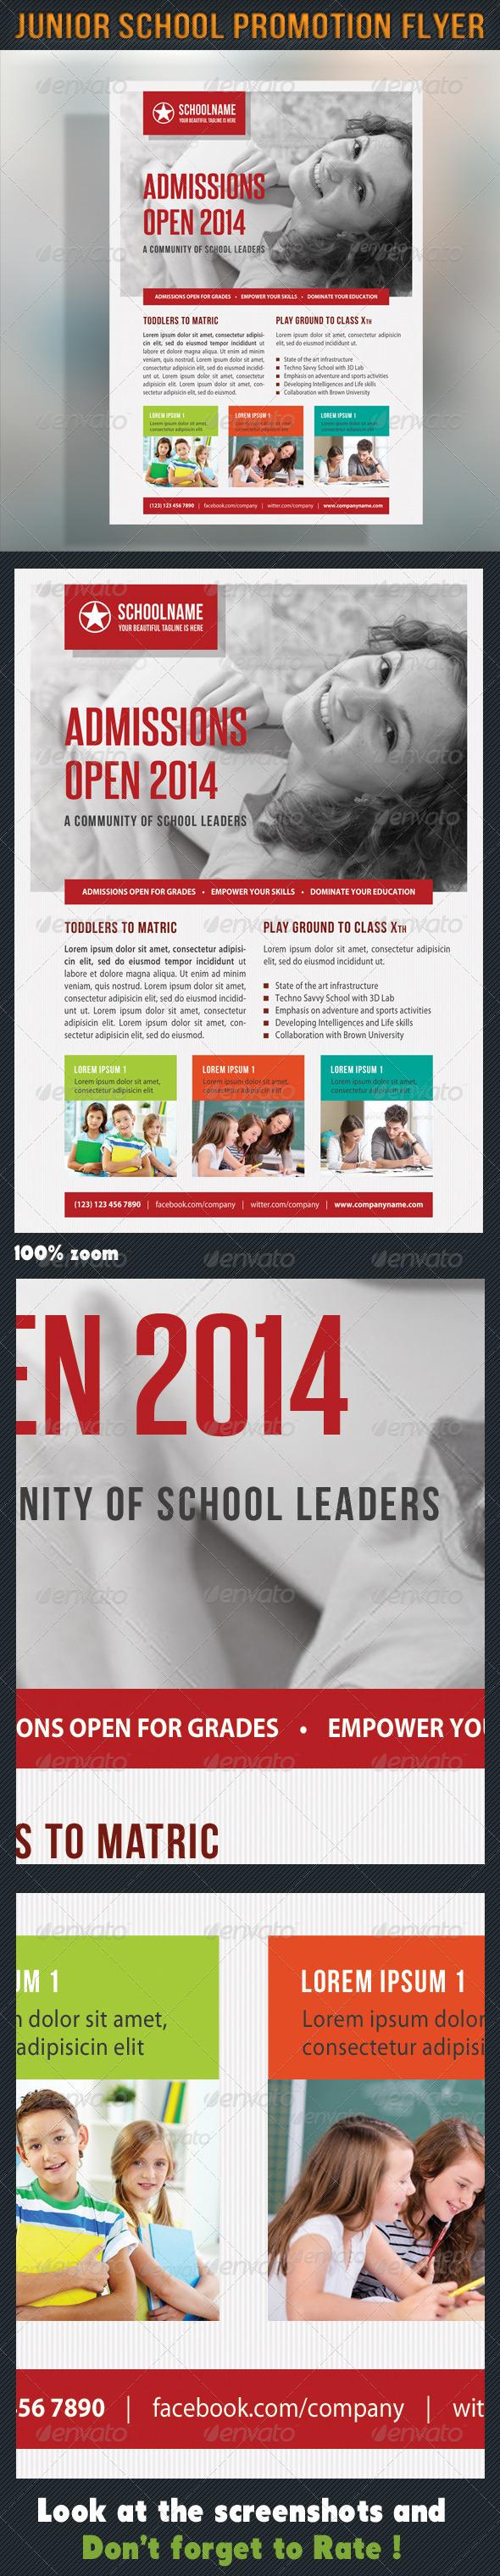 GraphicRiver Junior School Promotion Flyer 06 7150277